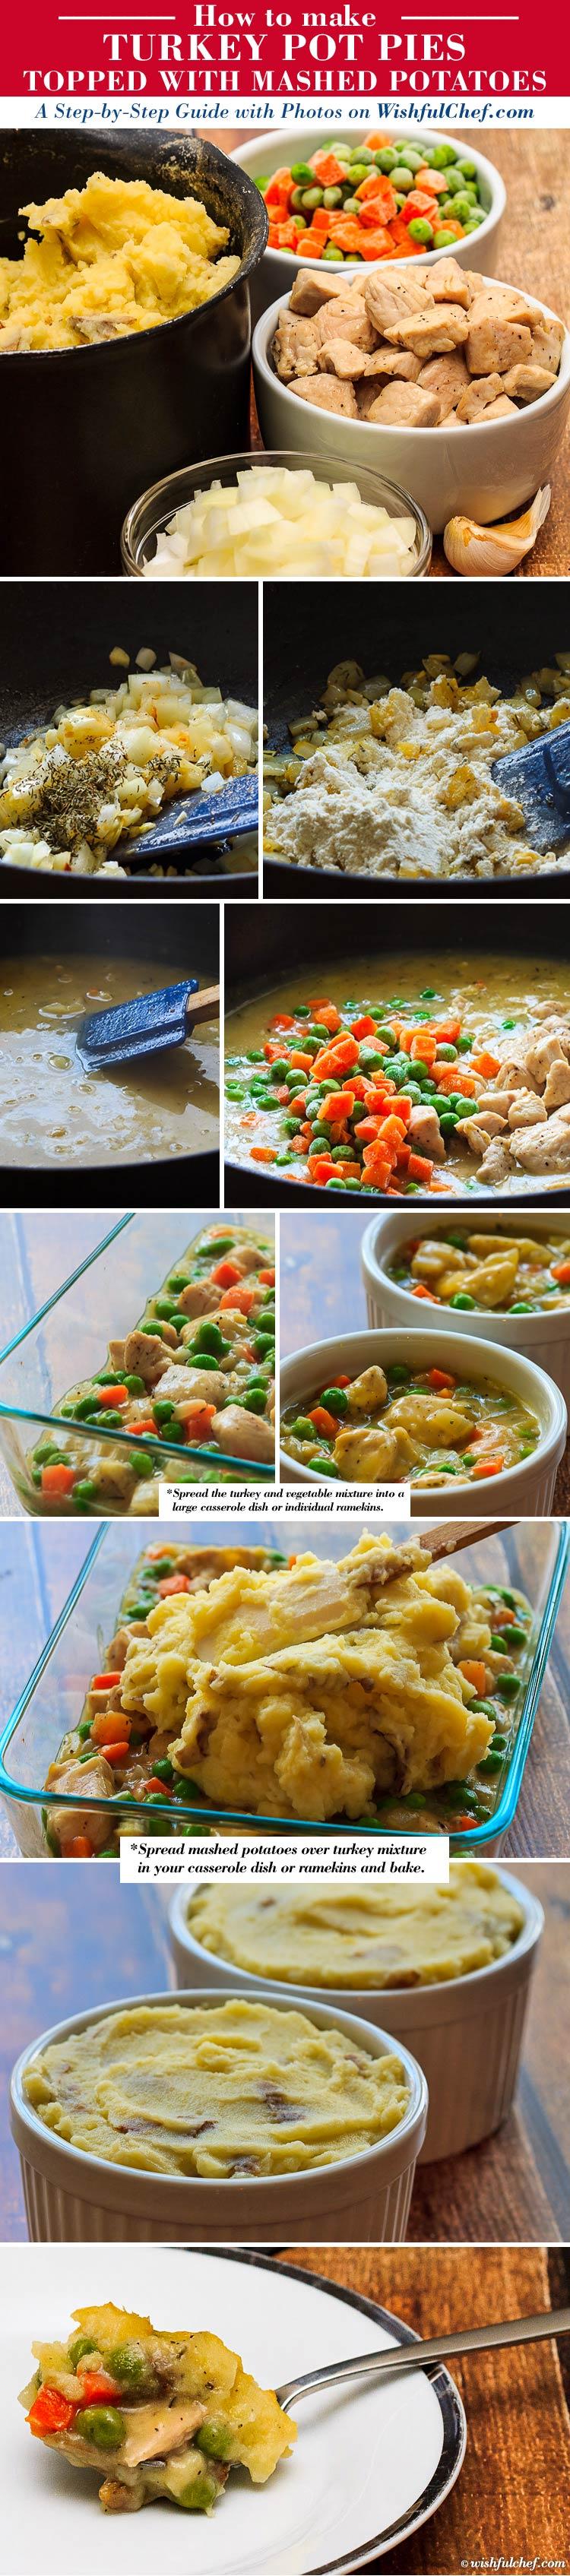 Turkey Pot Pie Mashed Potatoes